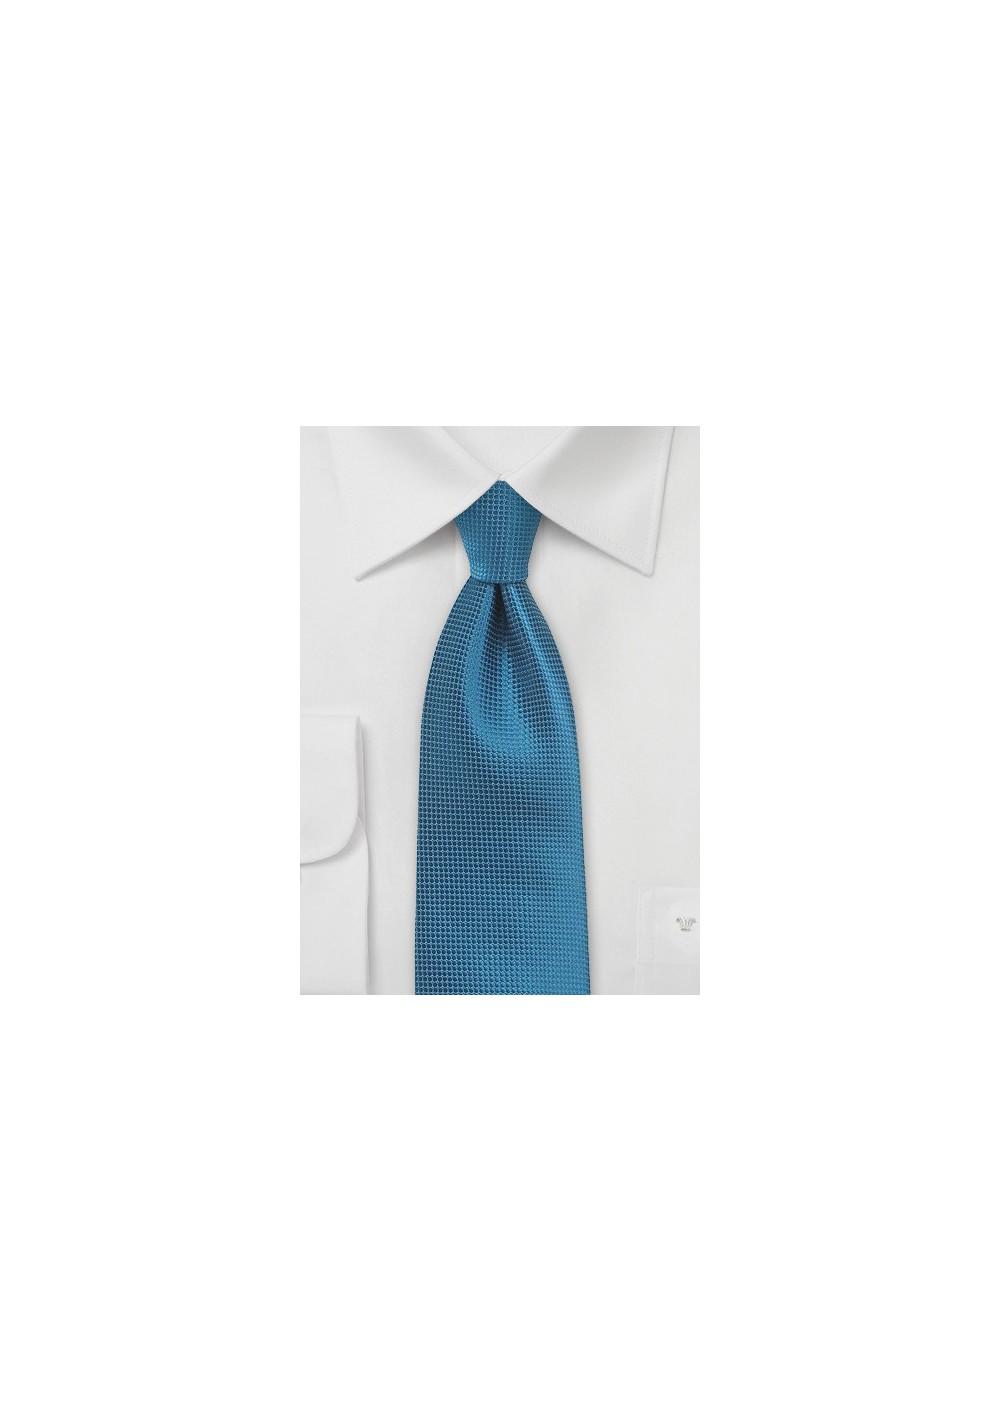 Ink Blue Colored Necktie